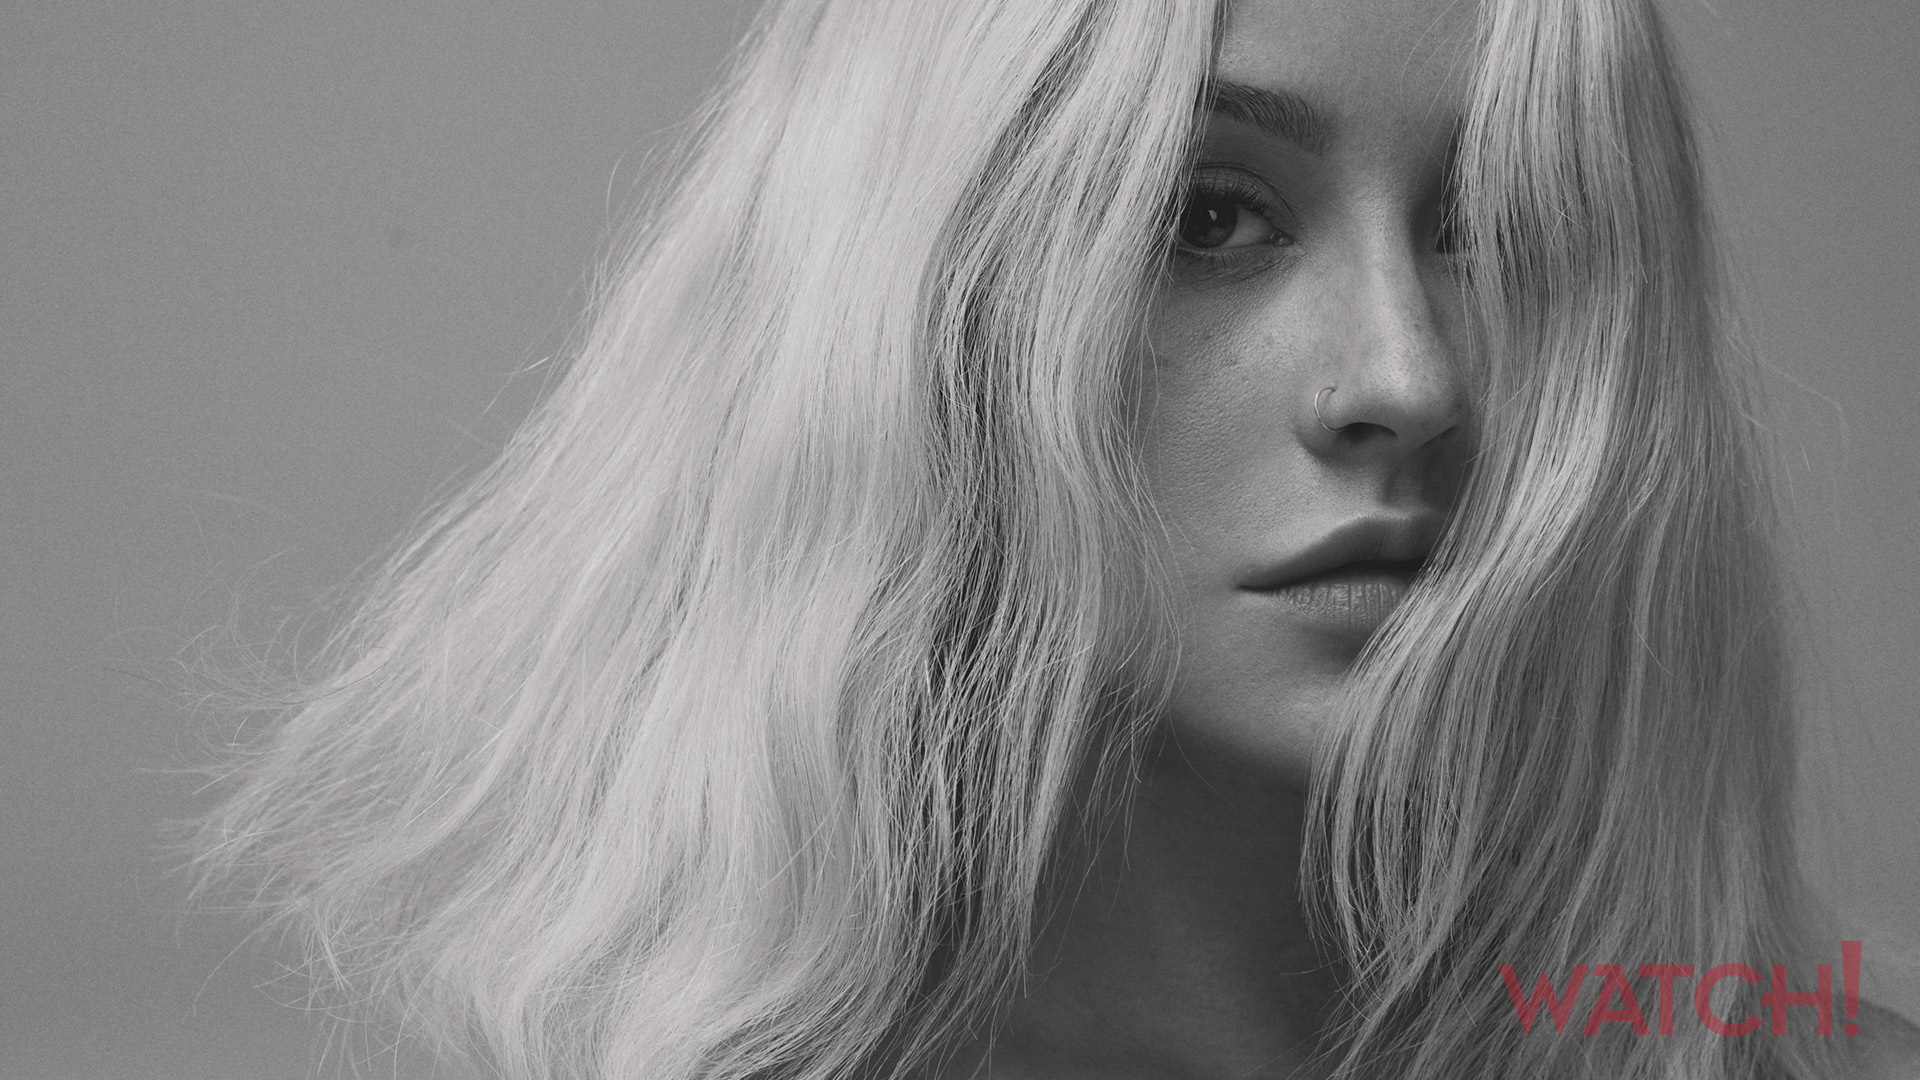 Christina Aguilera is beautiful in every single way